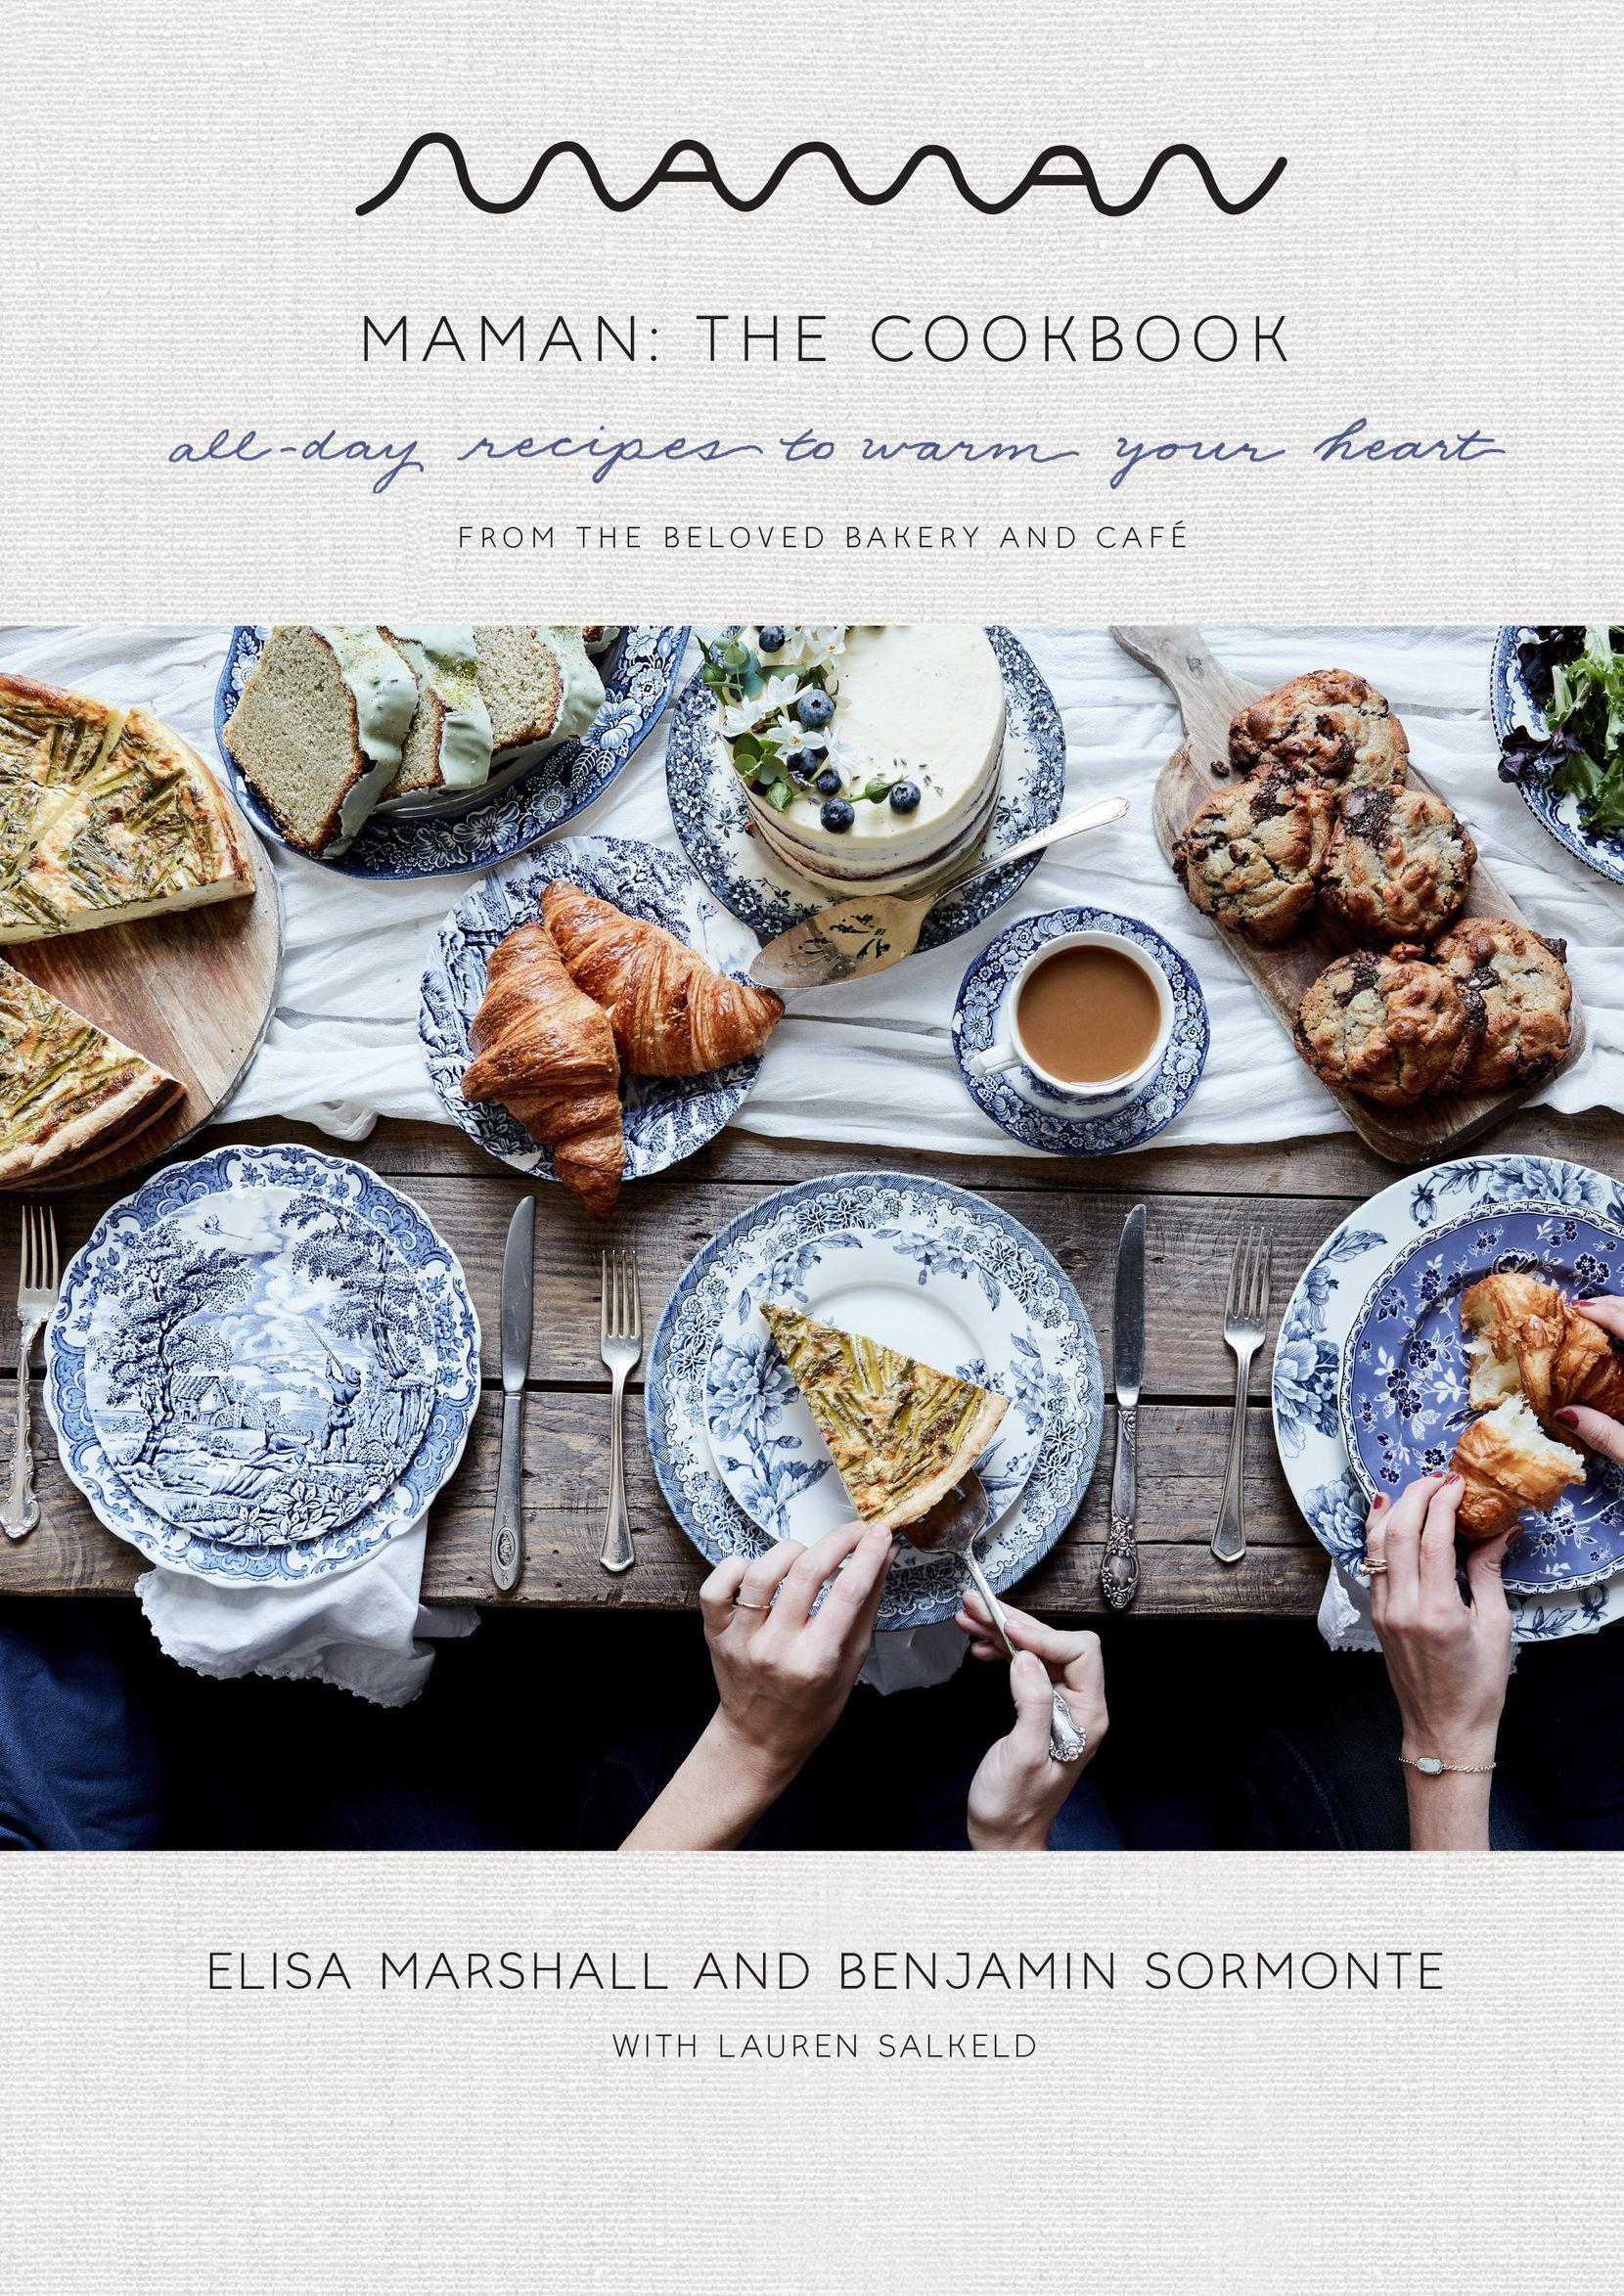 Maman: The Cookbook by Elisa Marshall and Benjamin Sormonte with Lauren Salkeld